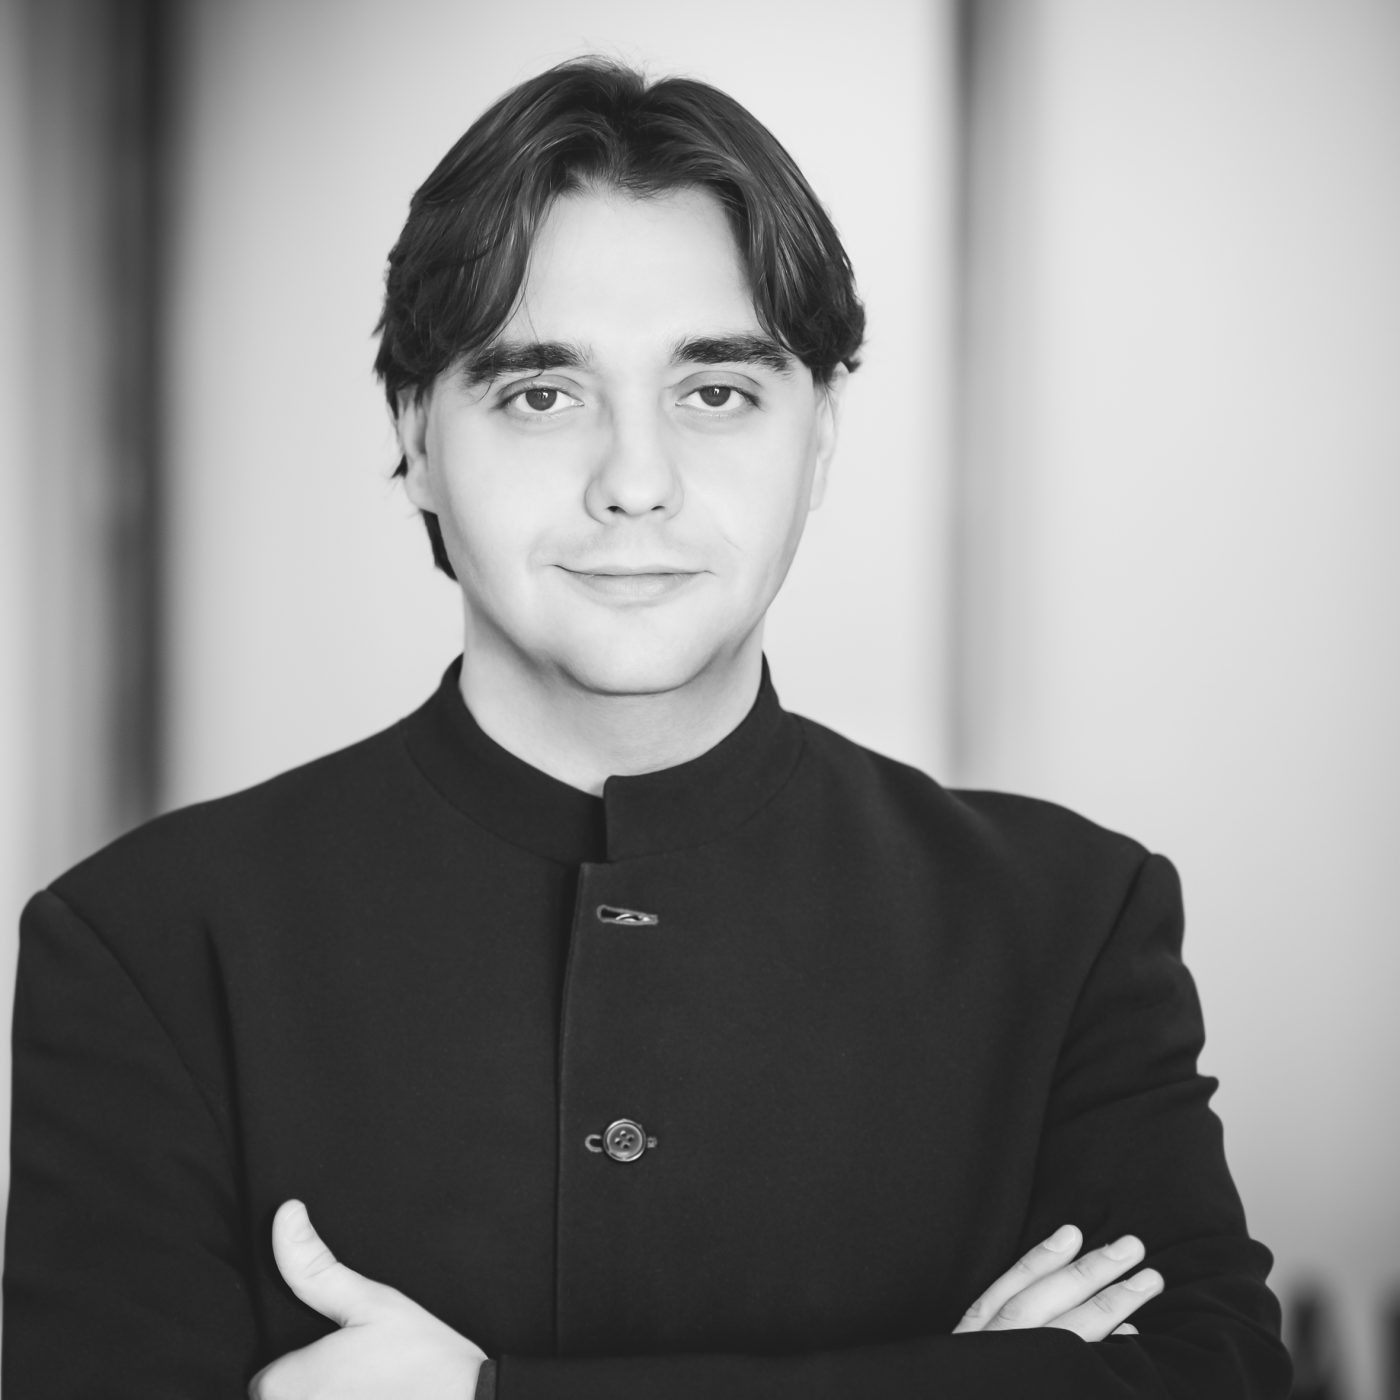 Jordi Bernàcer